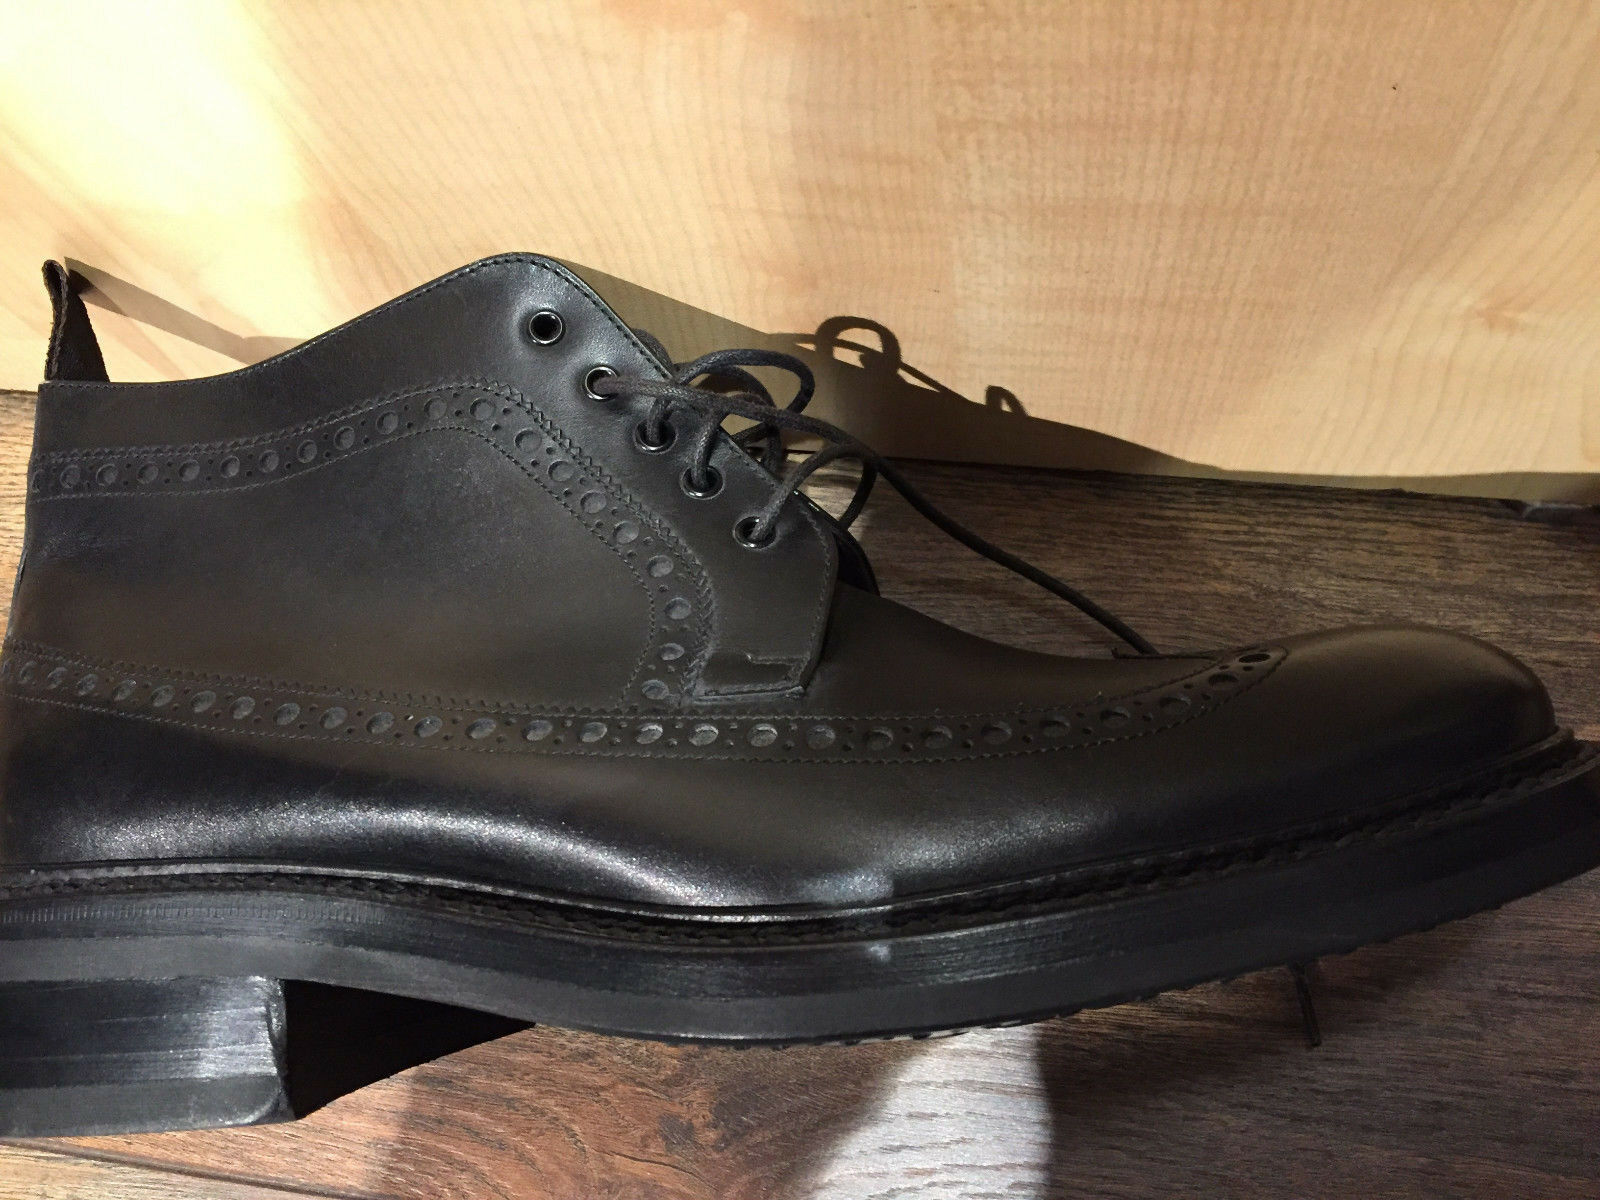 bottes Chaussures Cuir FRANCESCHETTI taille 41 NEUF    479,00 Euro  NOIR